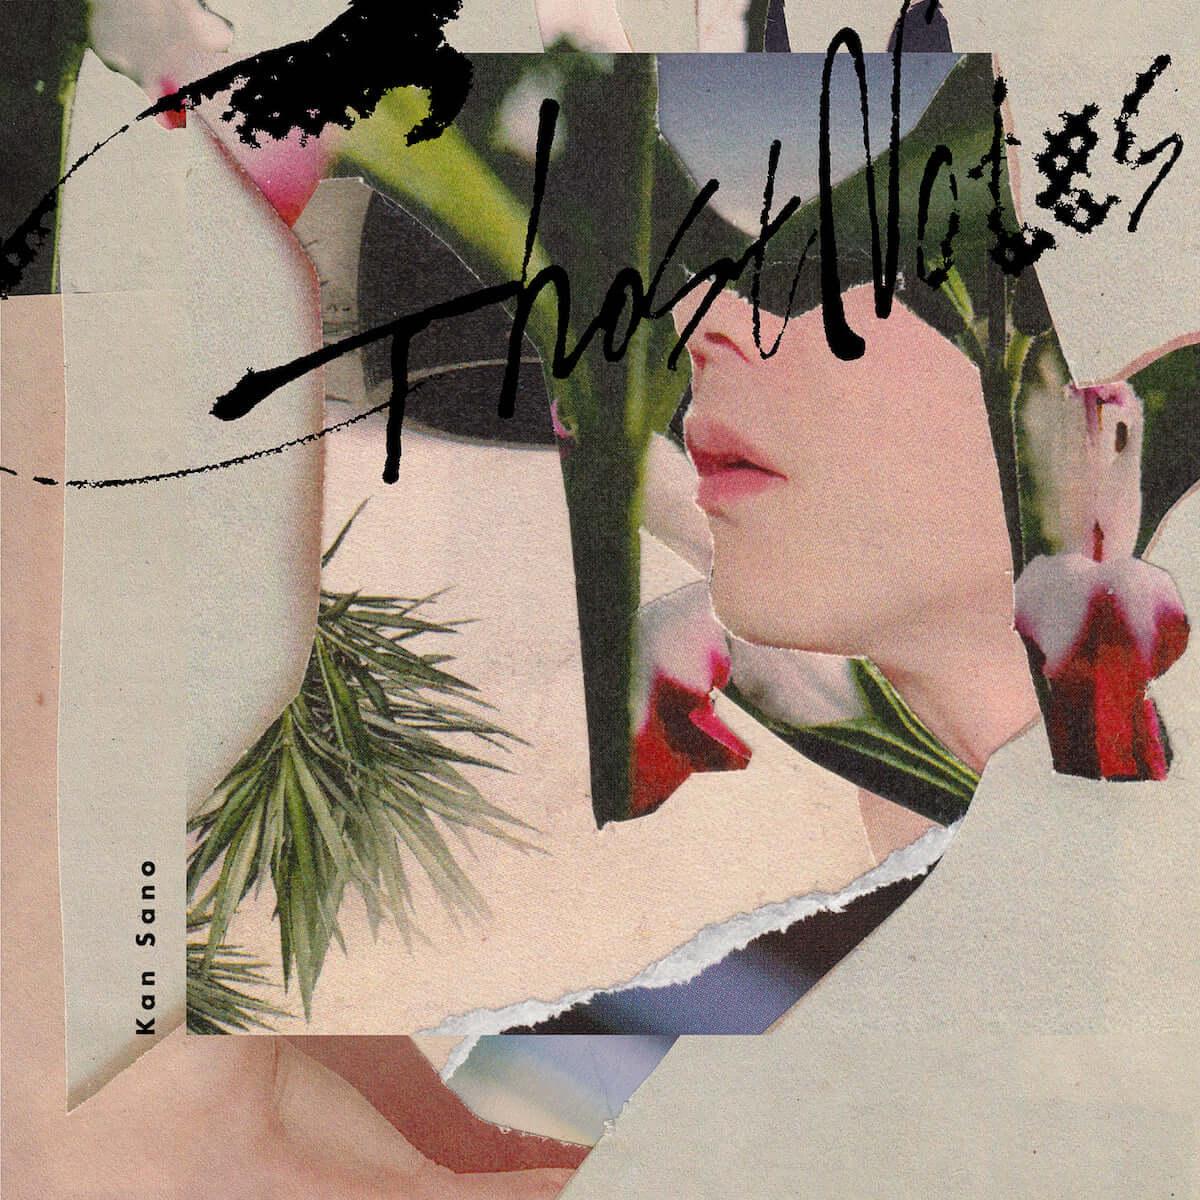 Kan Sano、待望の4thアルバム『Ghost notes』5月22日リリース決定! music190416_kansano-1200x1200